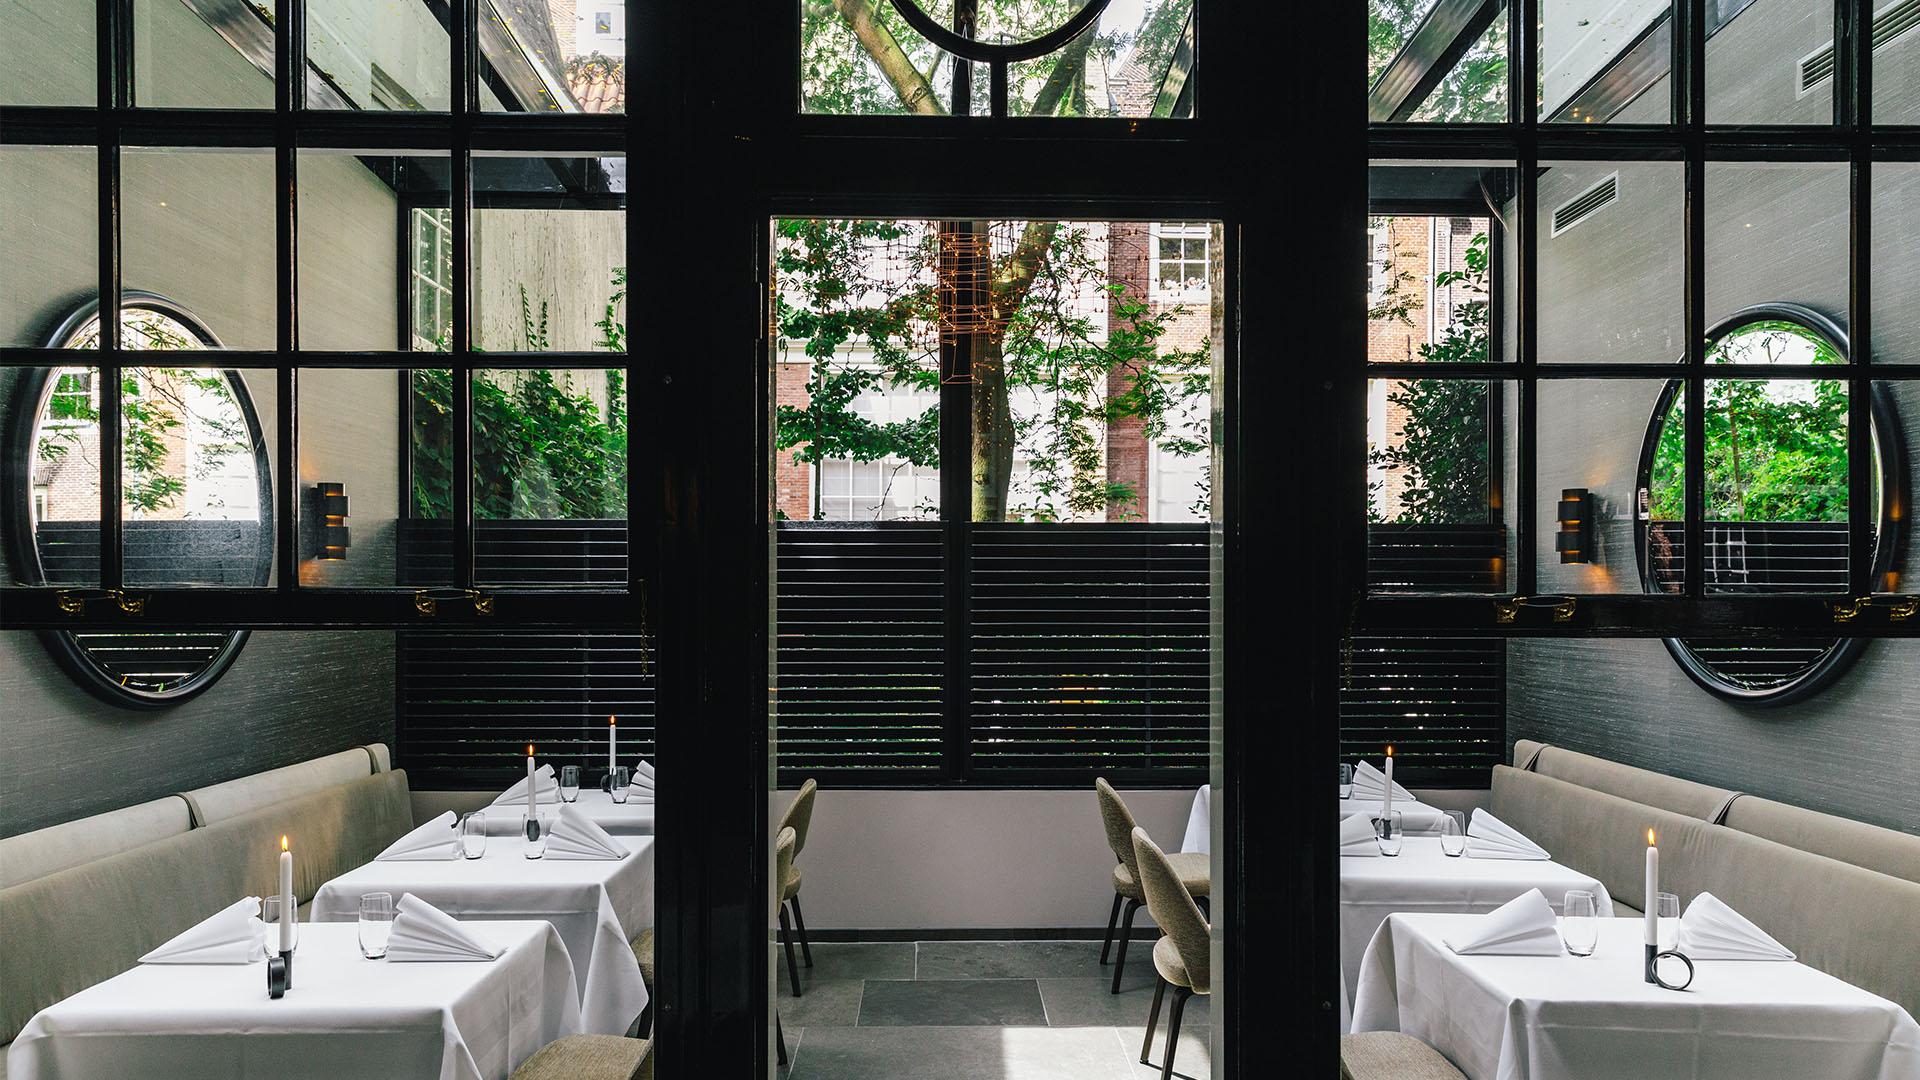 Christmas dinner inspiration from Michelin-starred restaurants